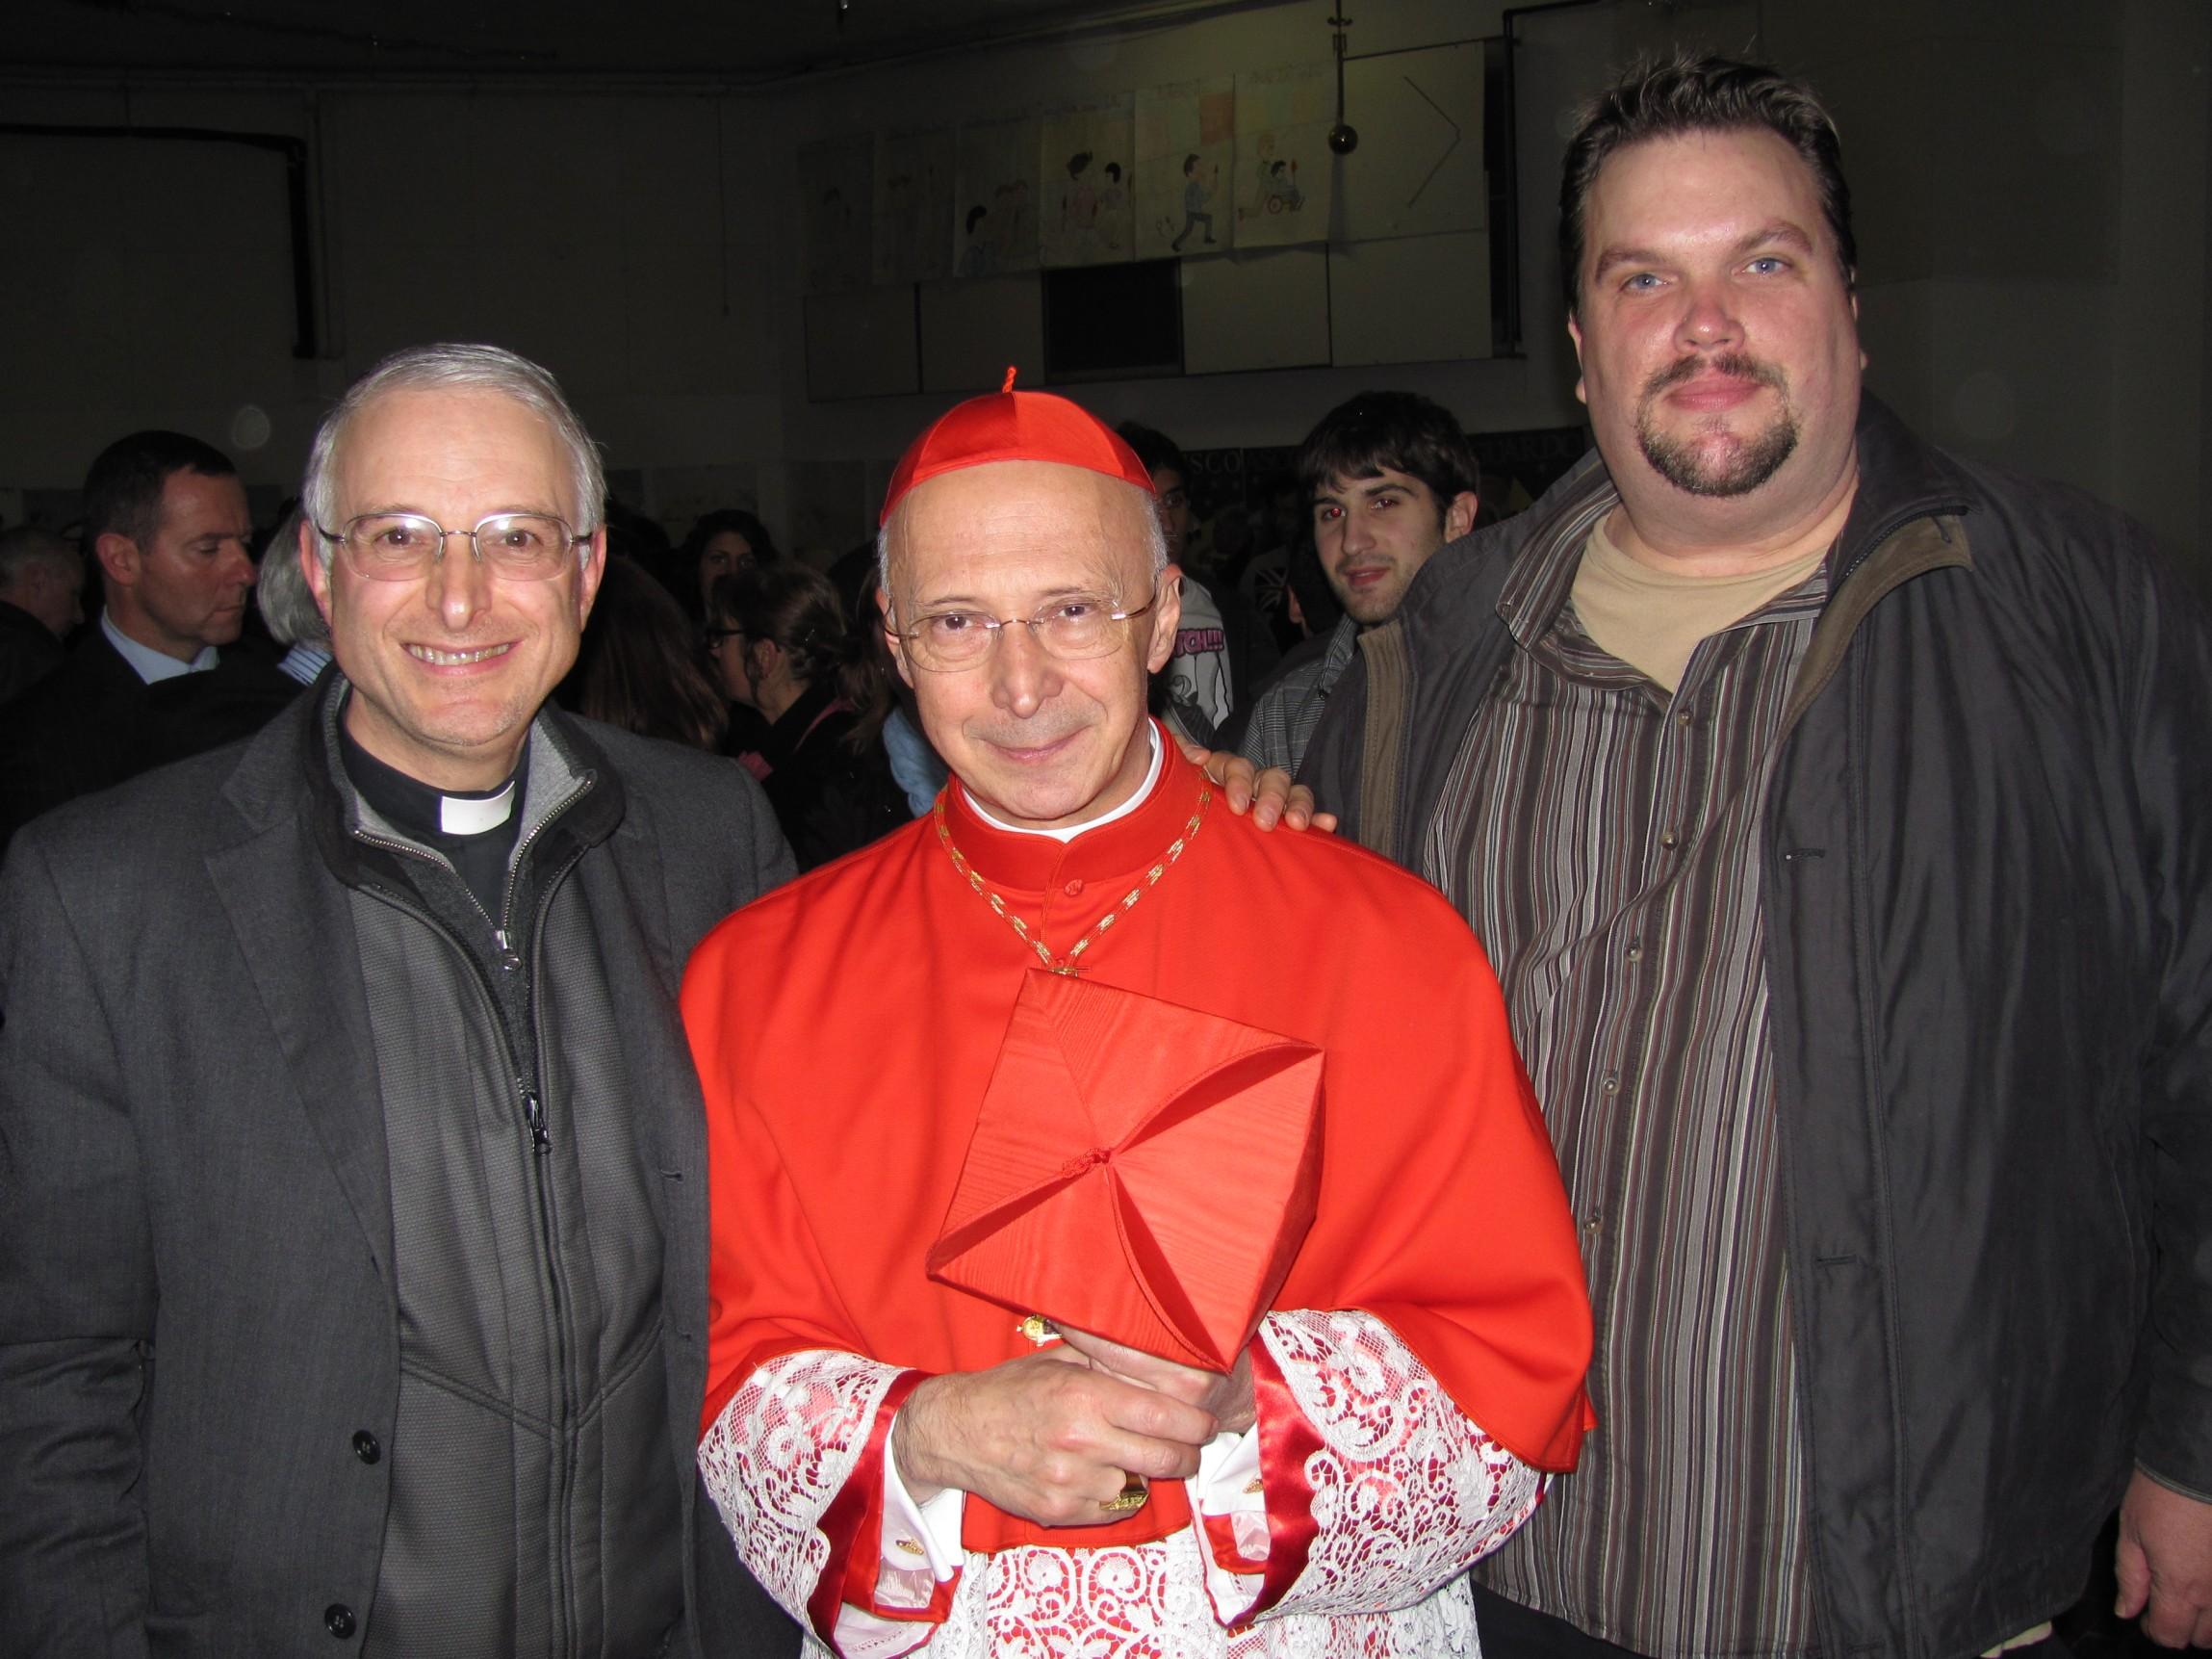 ingresso_giun_spirito_santo_2011-12-11-19-32-20